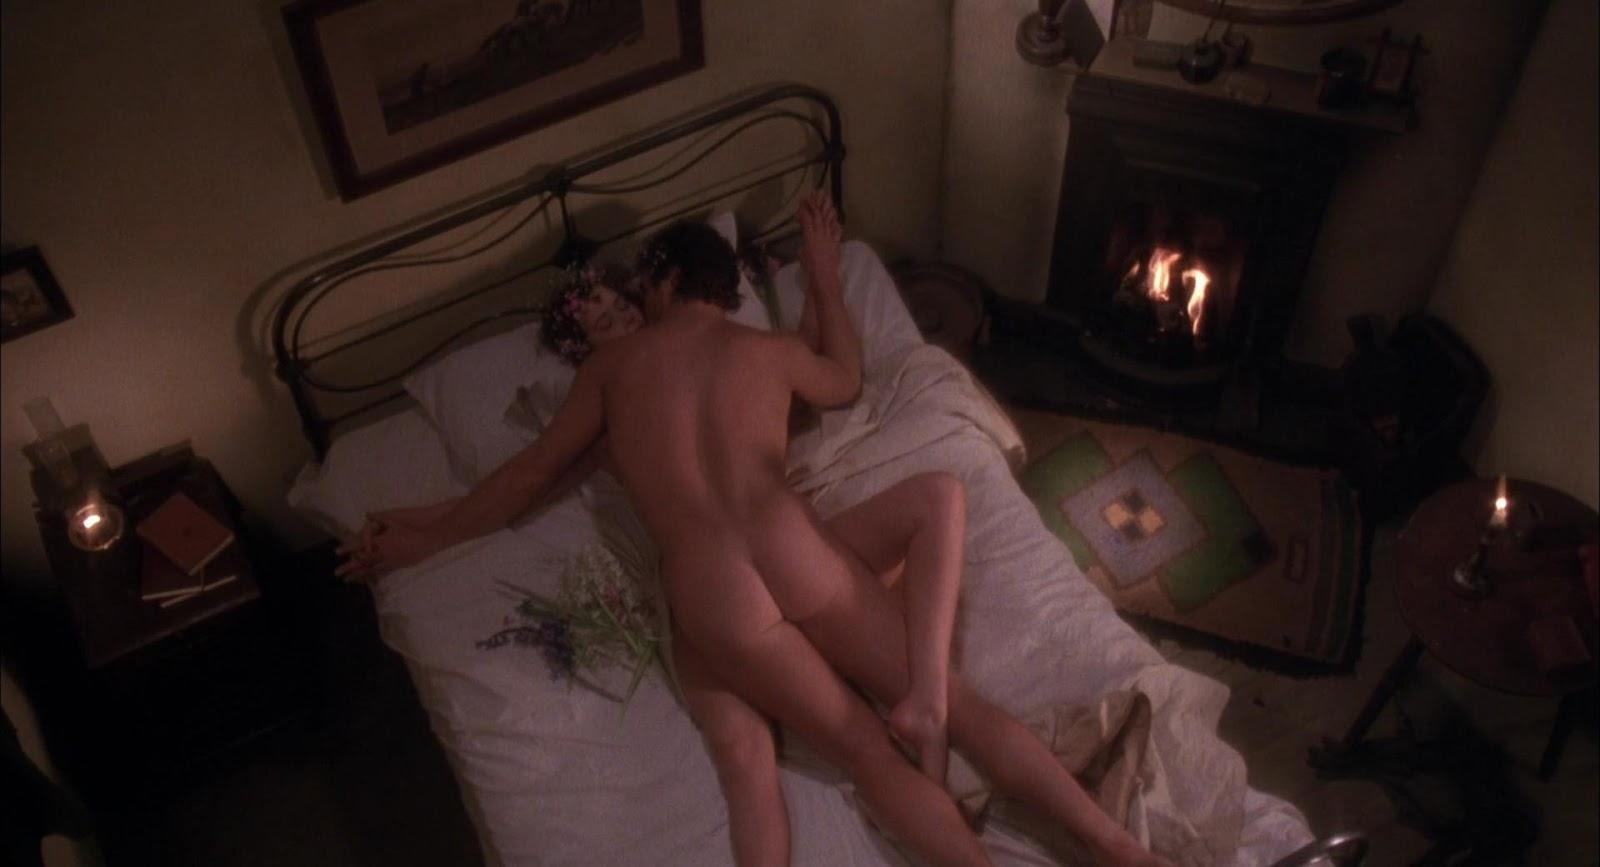 Кинофильм секс франция видео эротика